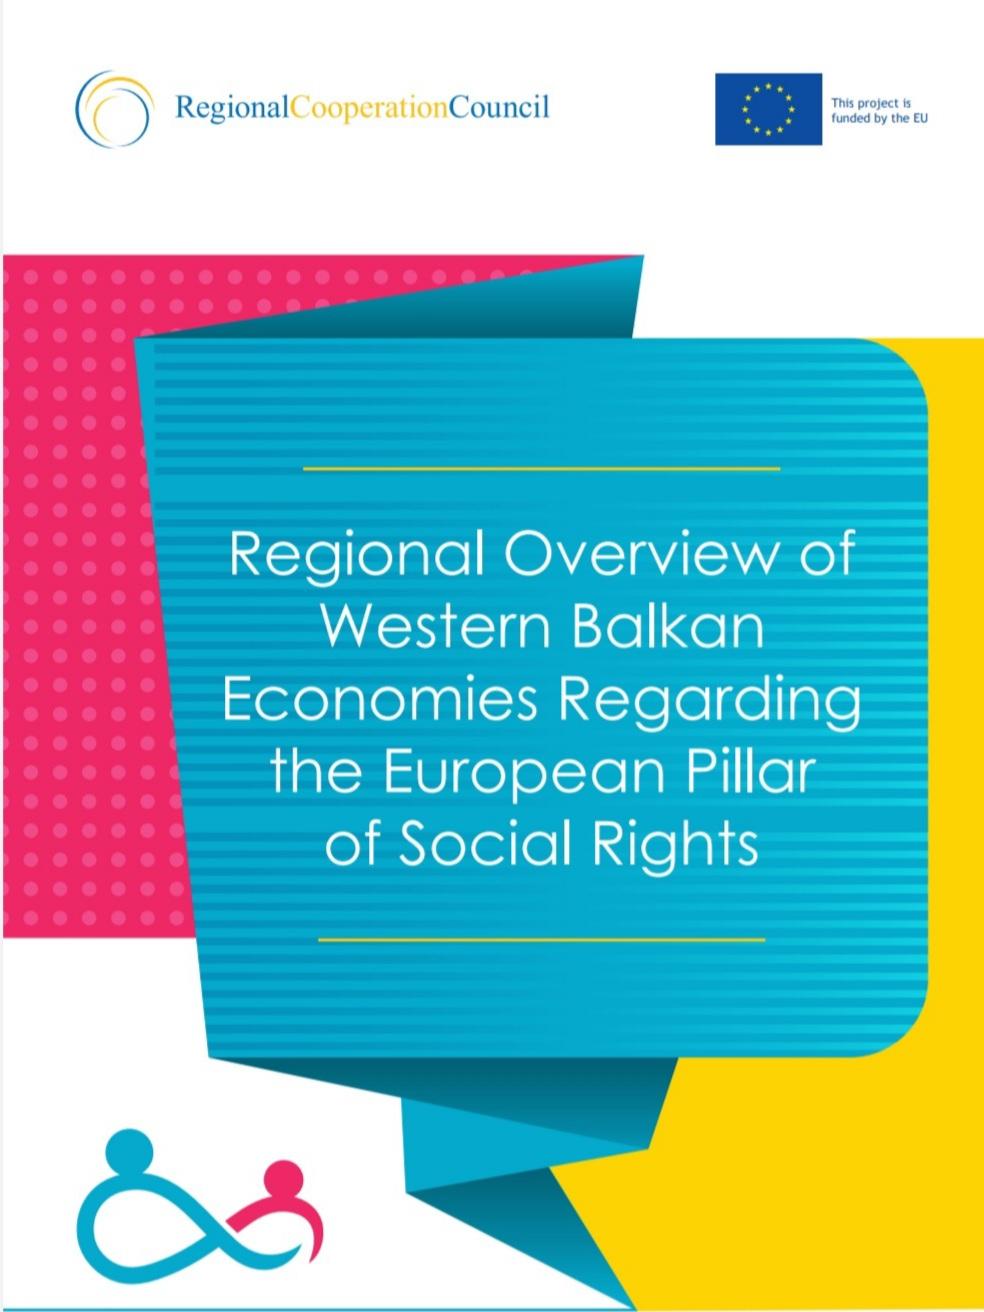 Regional Overview of Western Balkan Economies Regarding the European Pillar of Social Rights